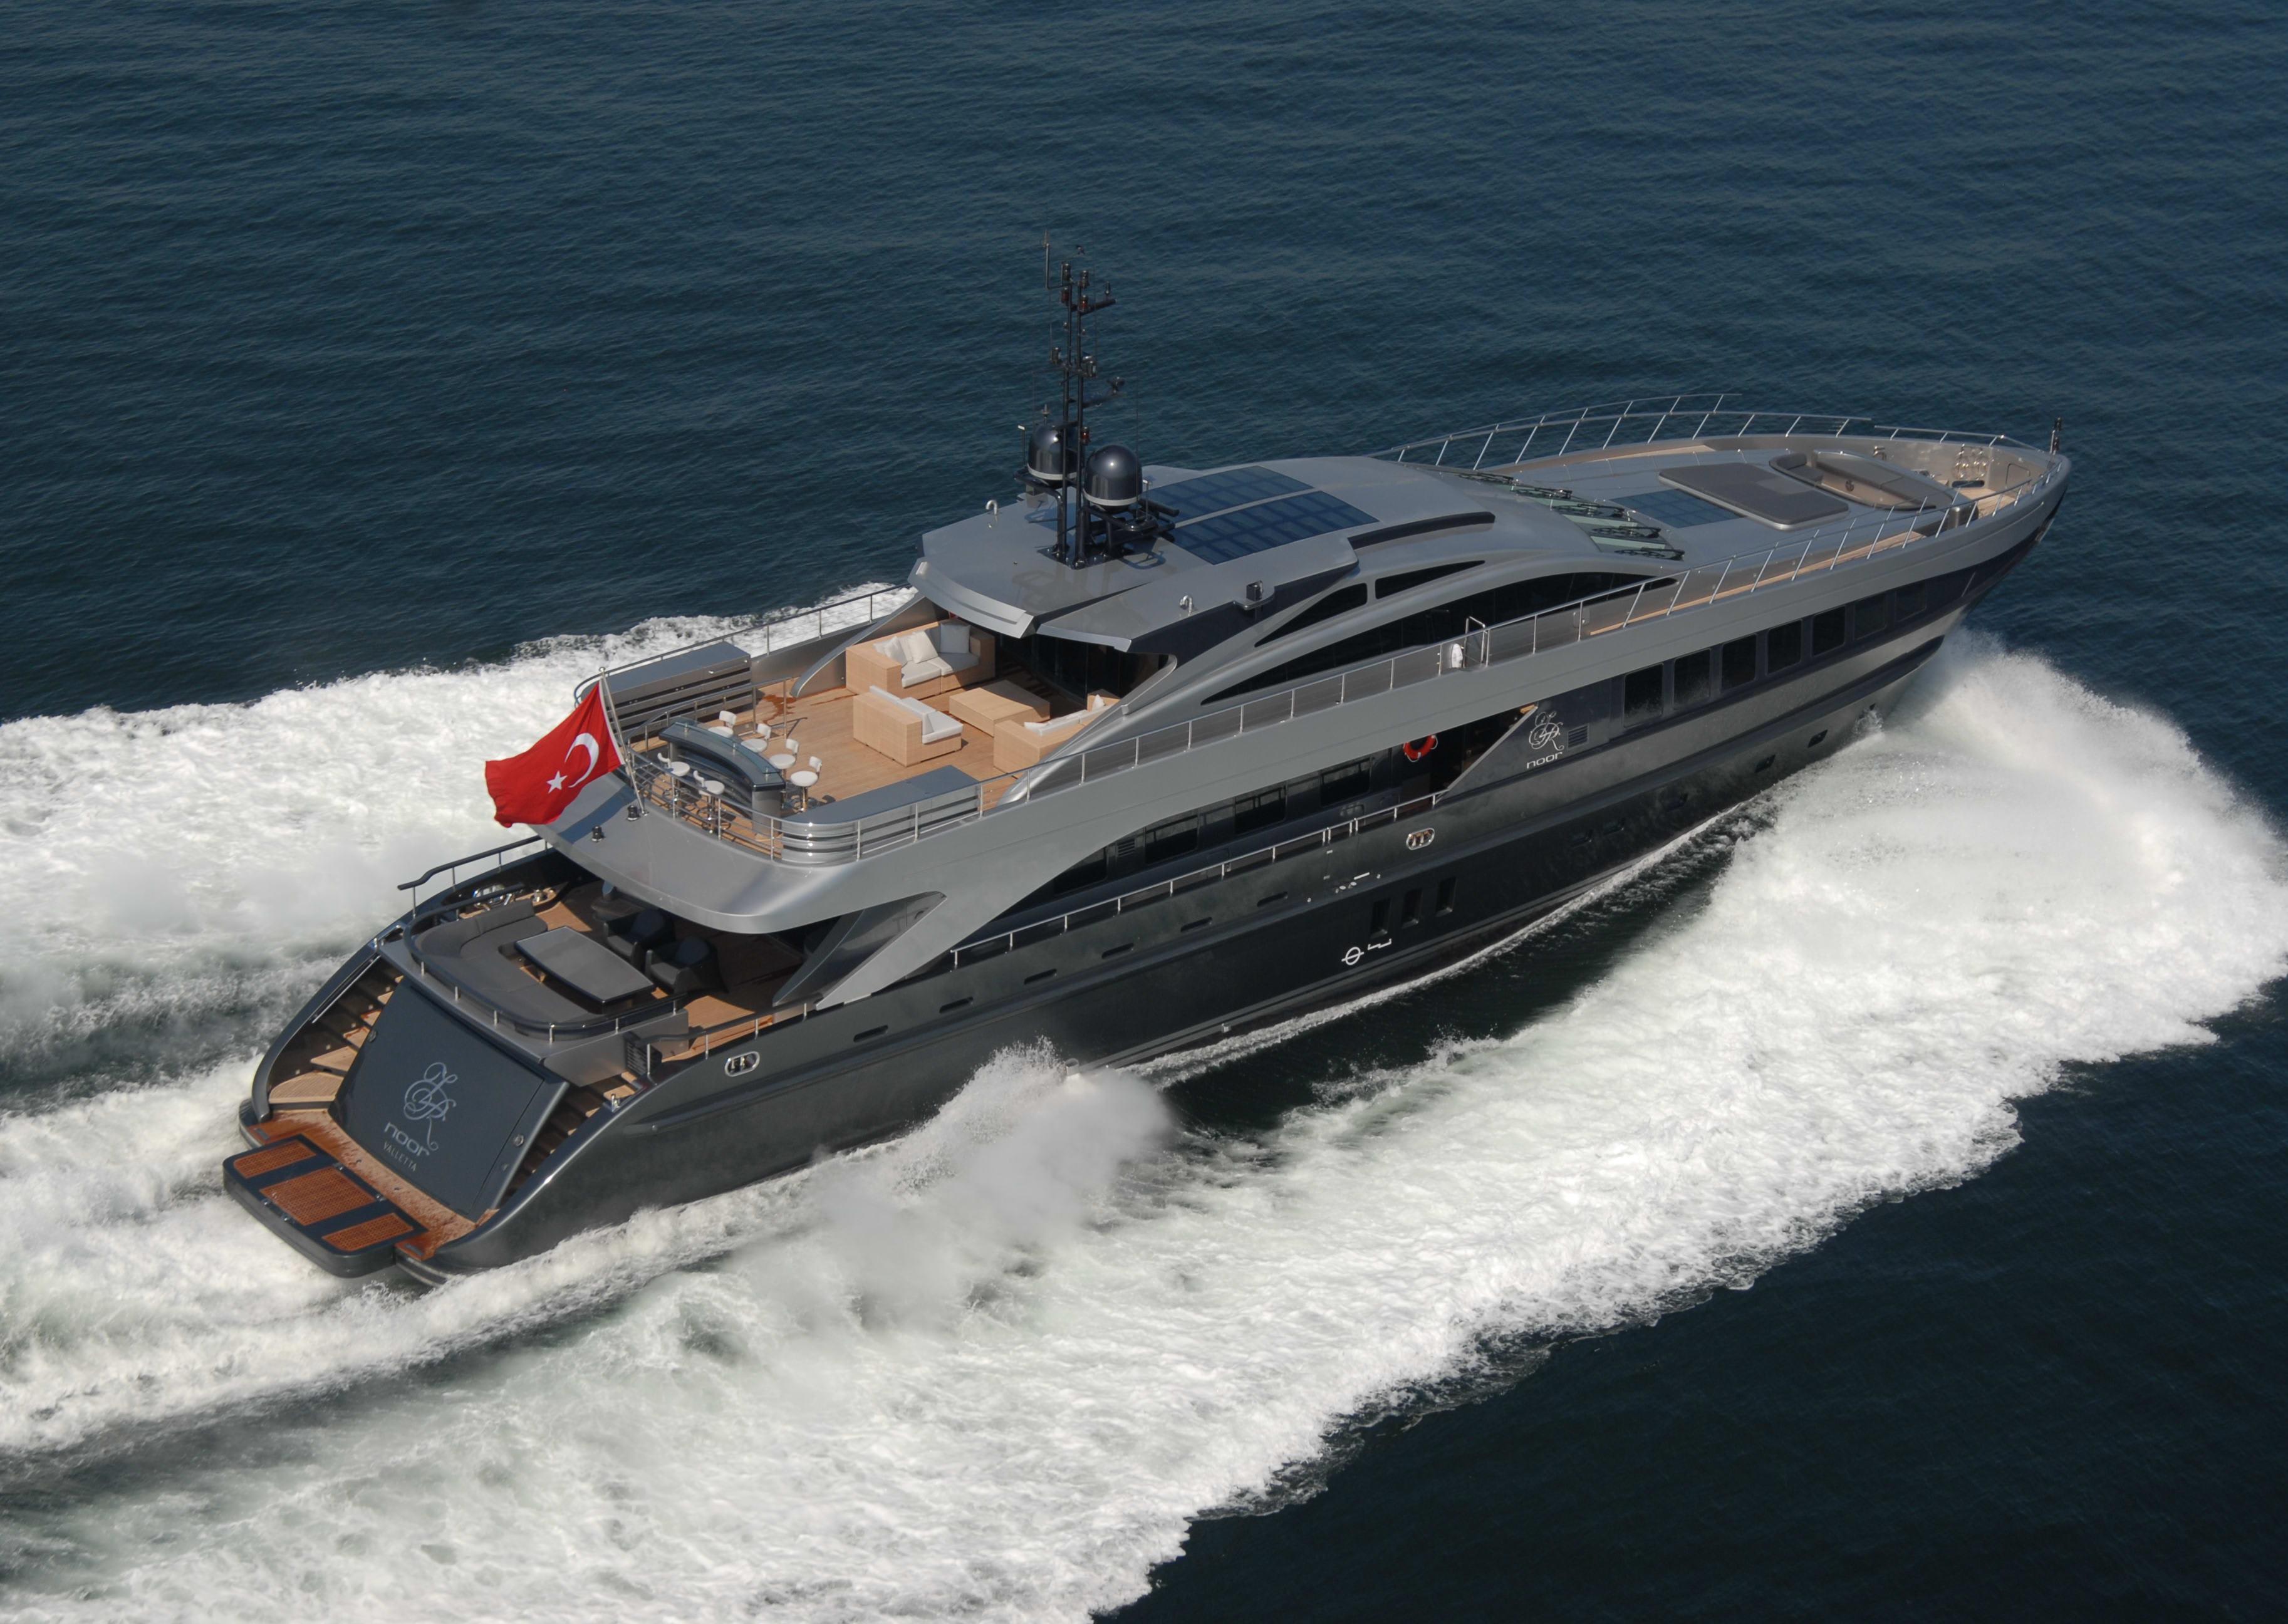 Image of Rl Noor 37.5M (123.0FT) motor yacht